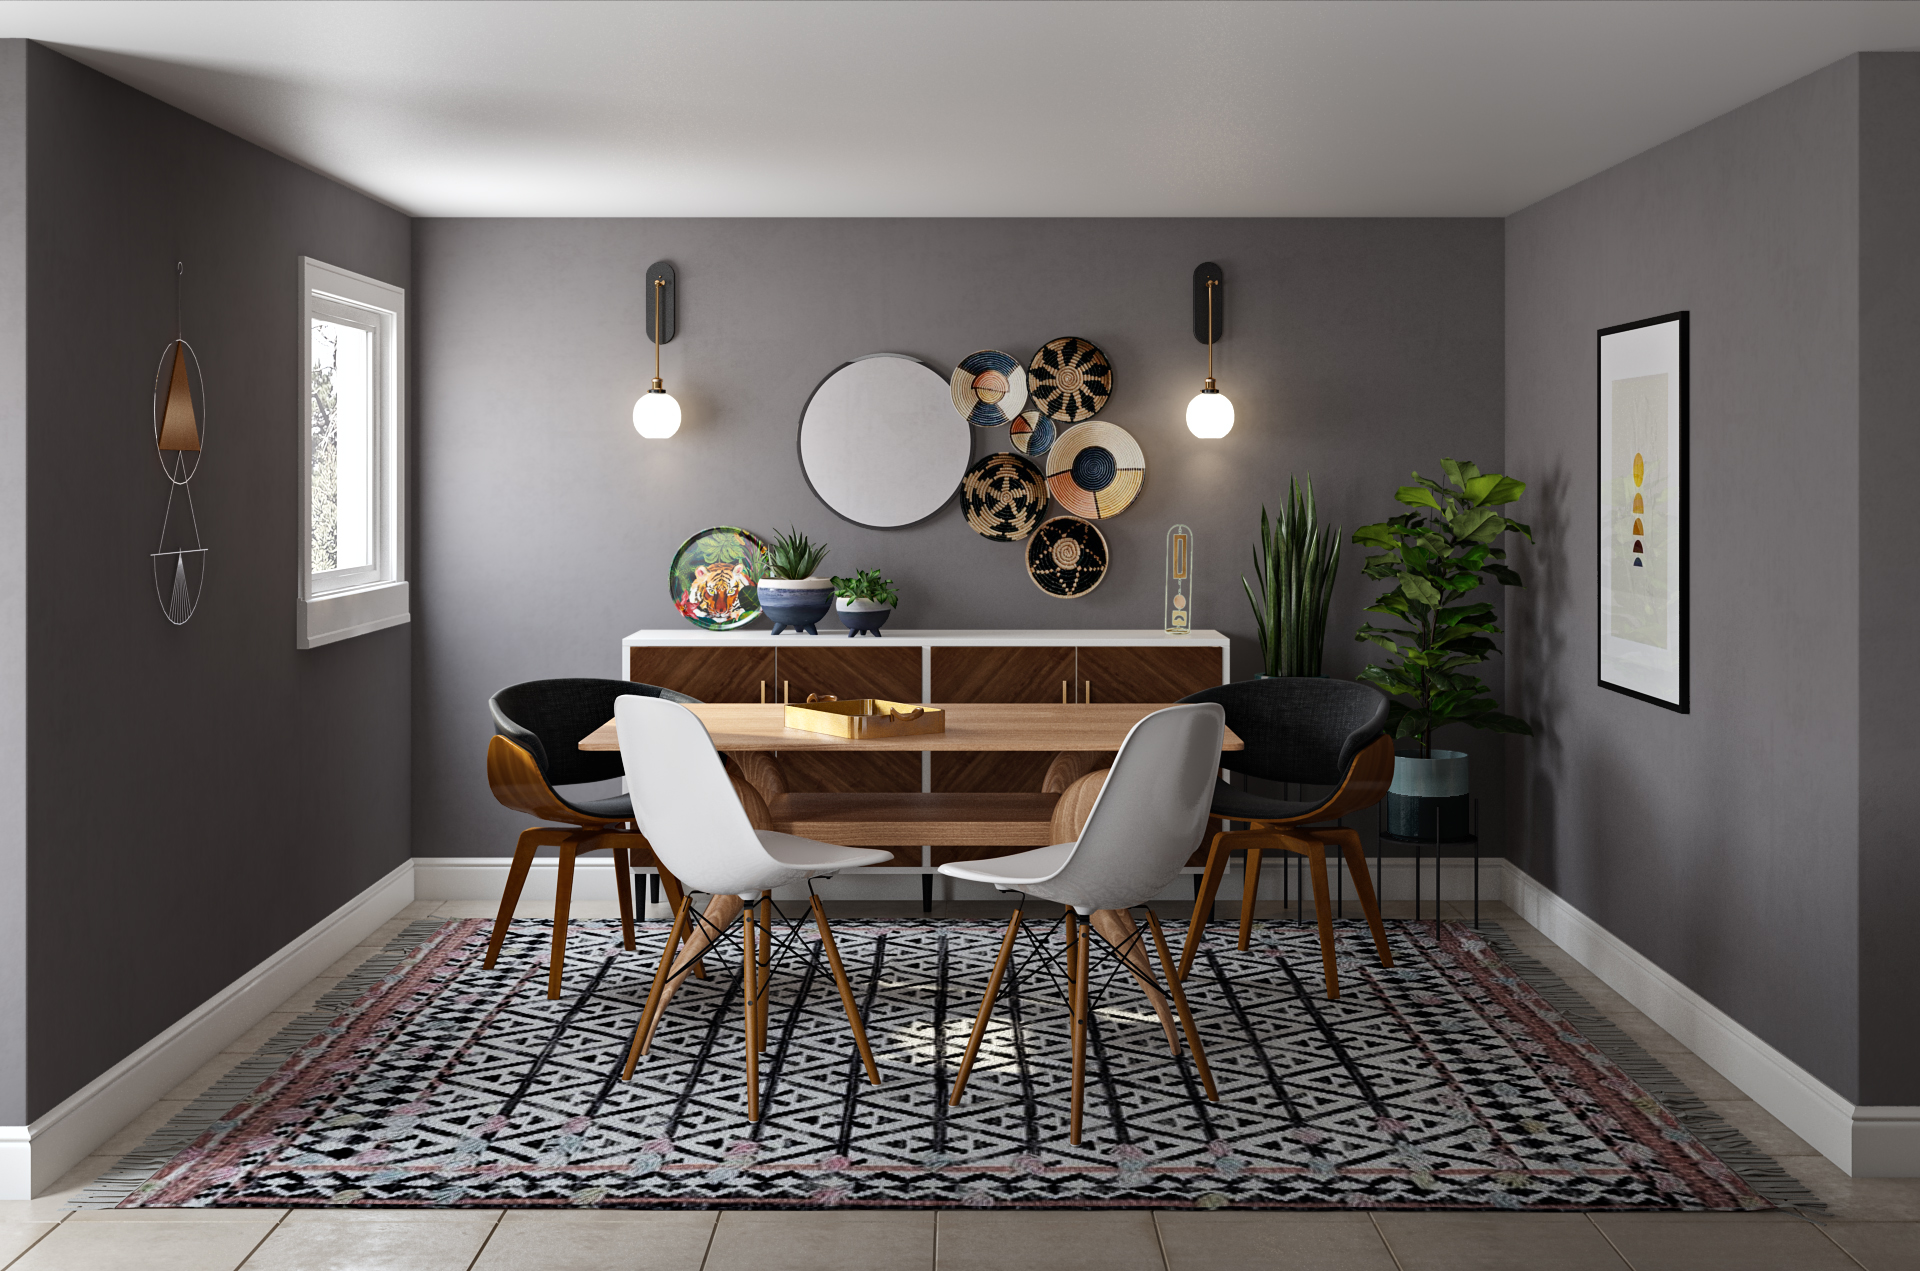 Modern Eclectic Bohemian Midcentury Modern Room Design By Havenly Interior Designer Natalie